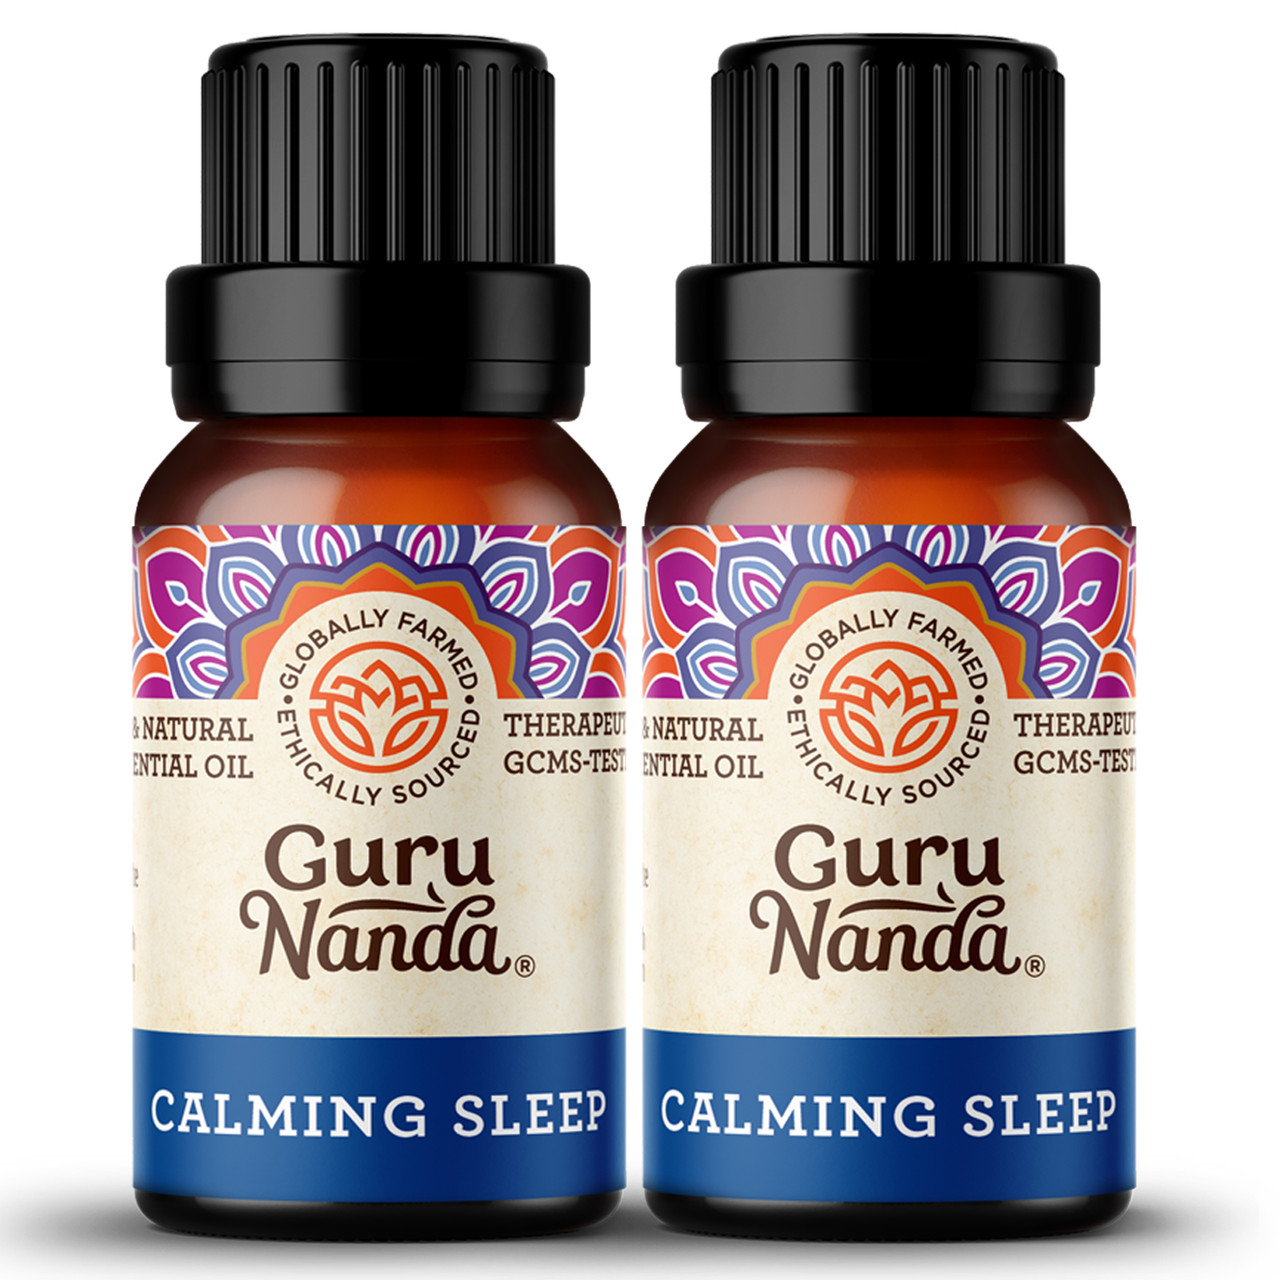 Calming Sleep Blend 100 Pure Essential Oil Guru Nanda 2 Pack